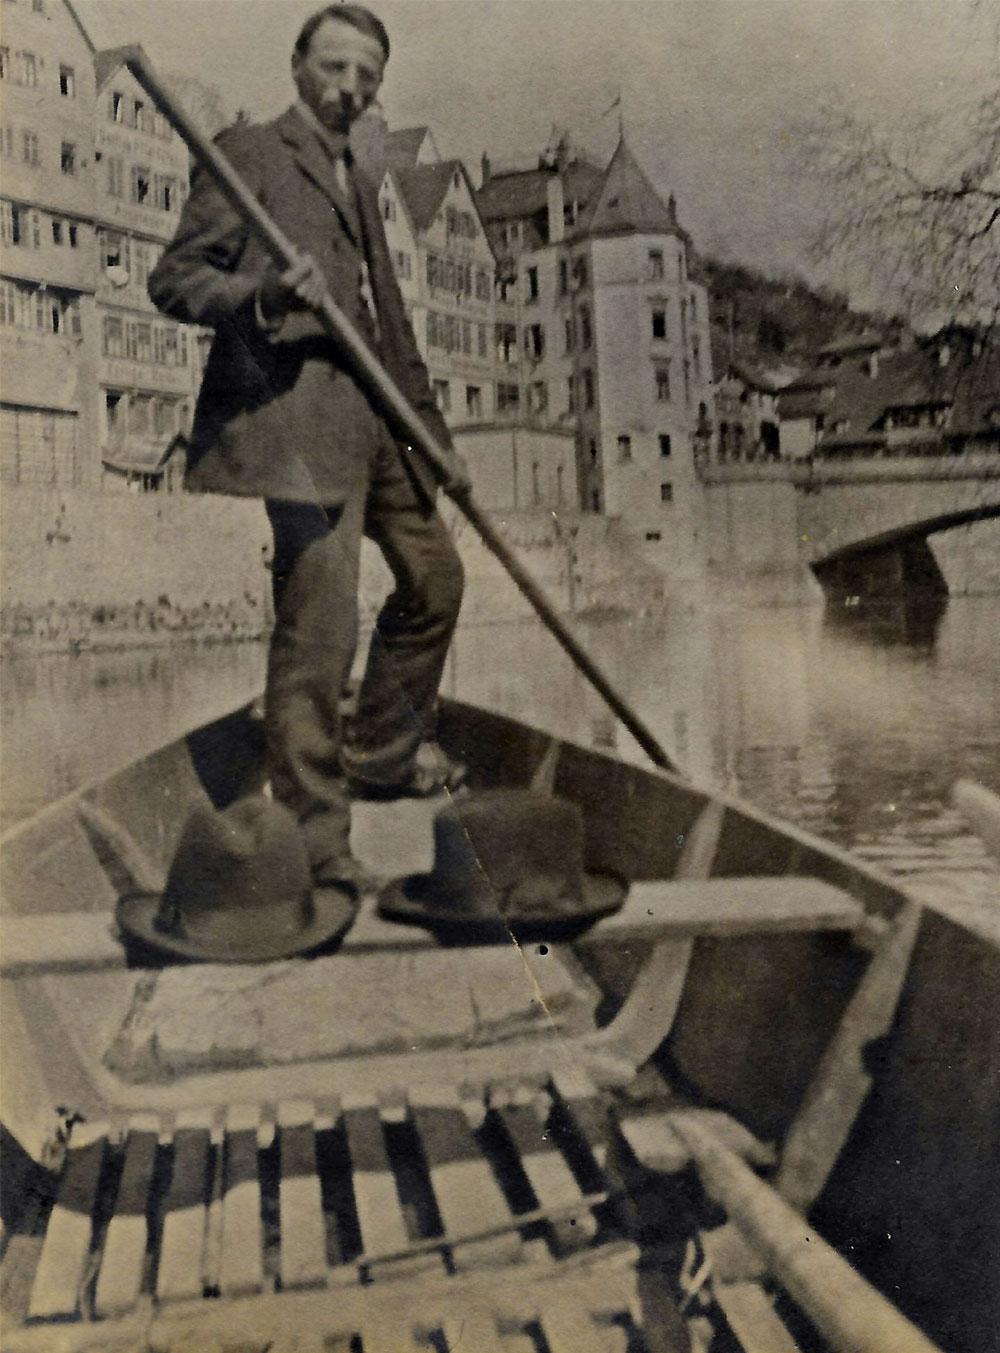 Historischer Stocherkahn Tübingen